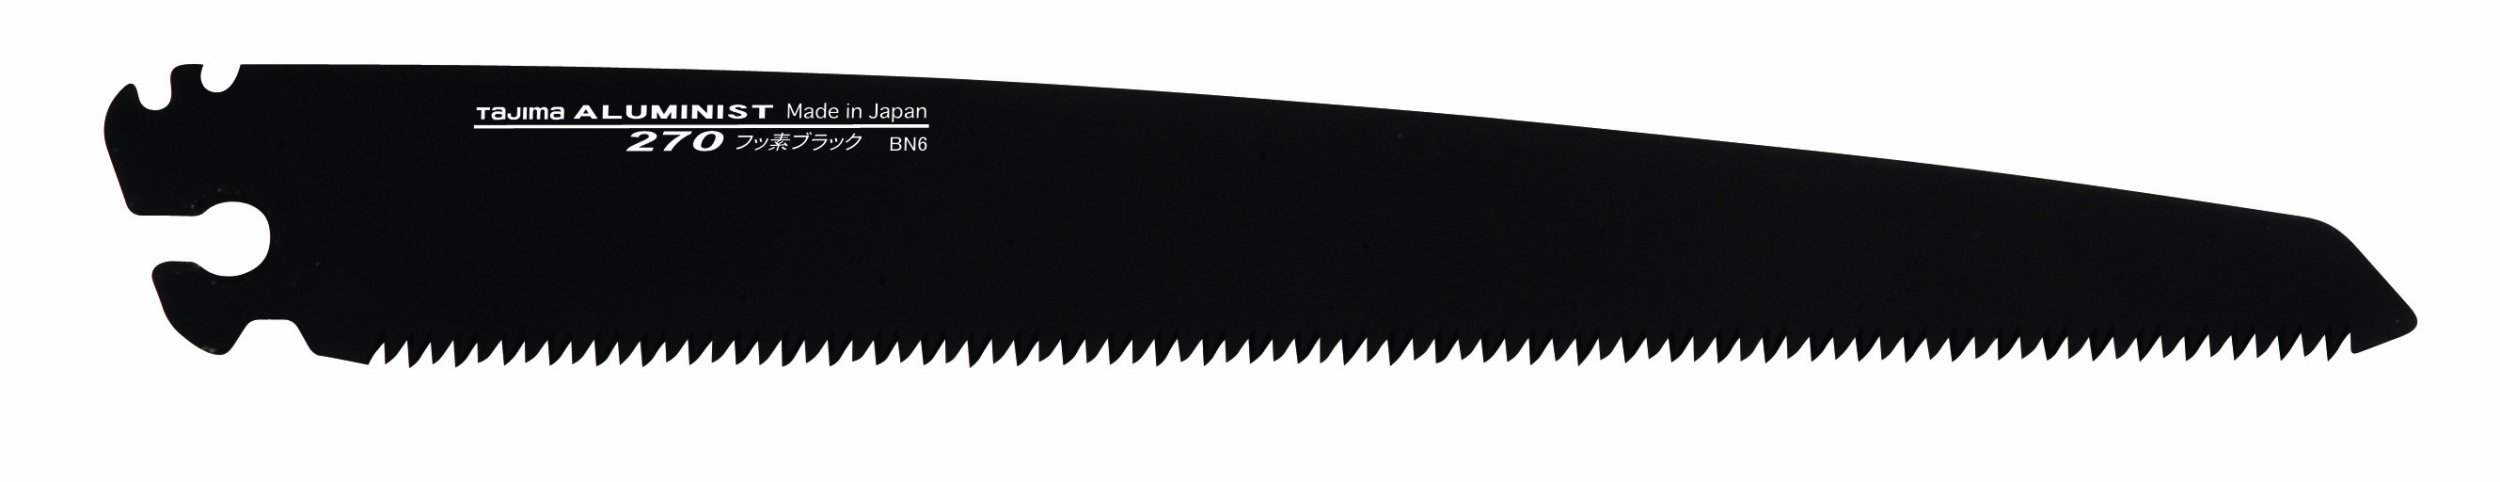 Tajima ALB-A240 Japanese Precision Hand Saw Replacement Aluminist Black Blade - 240mm - 9.4 inch - 9 TPI Fluoro-Coat Blade